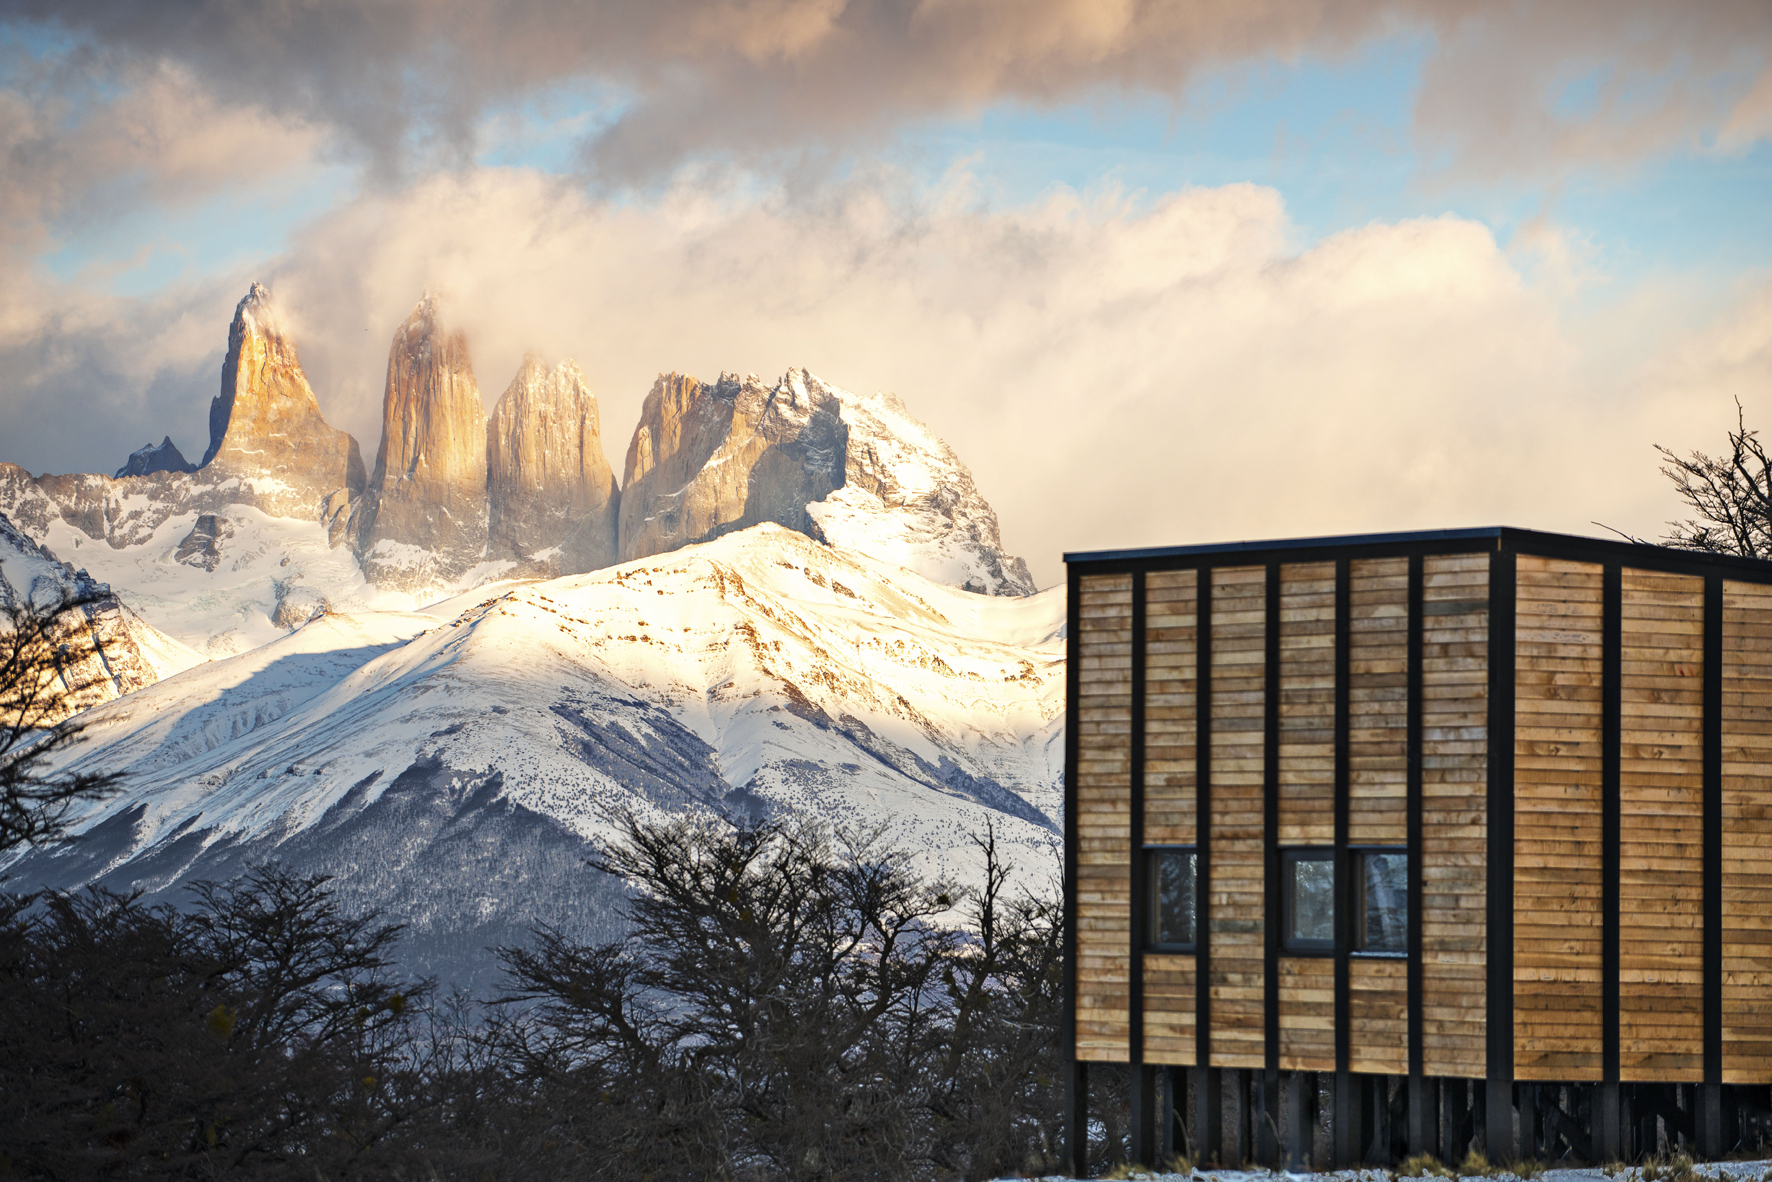 Villas Exteriors Awasi Patagonia (11).jpg